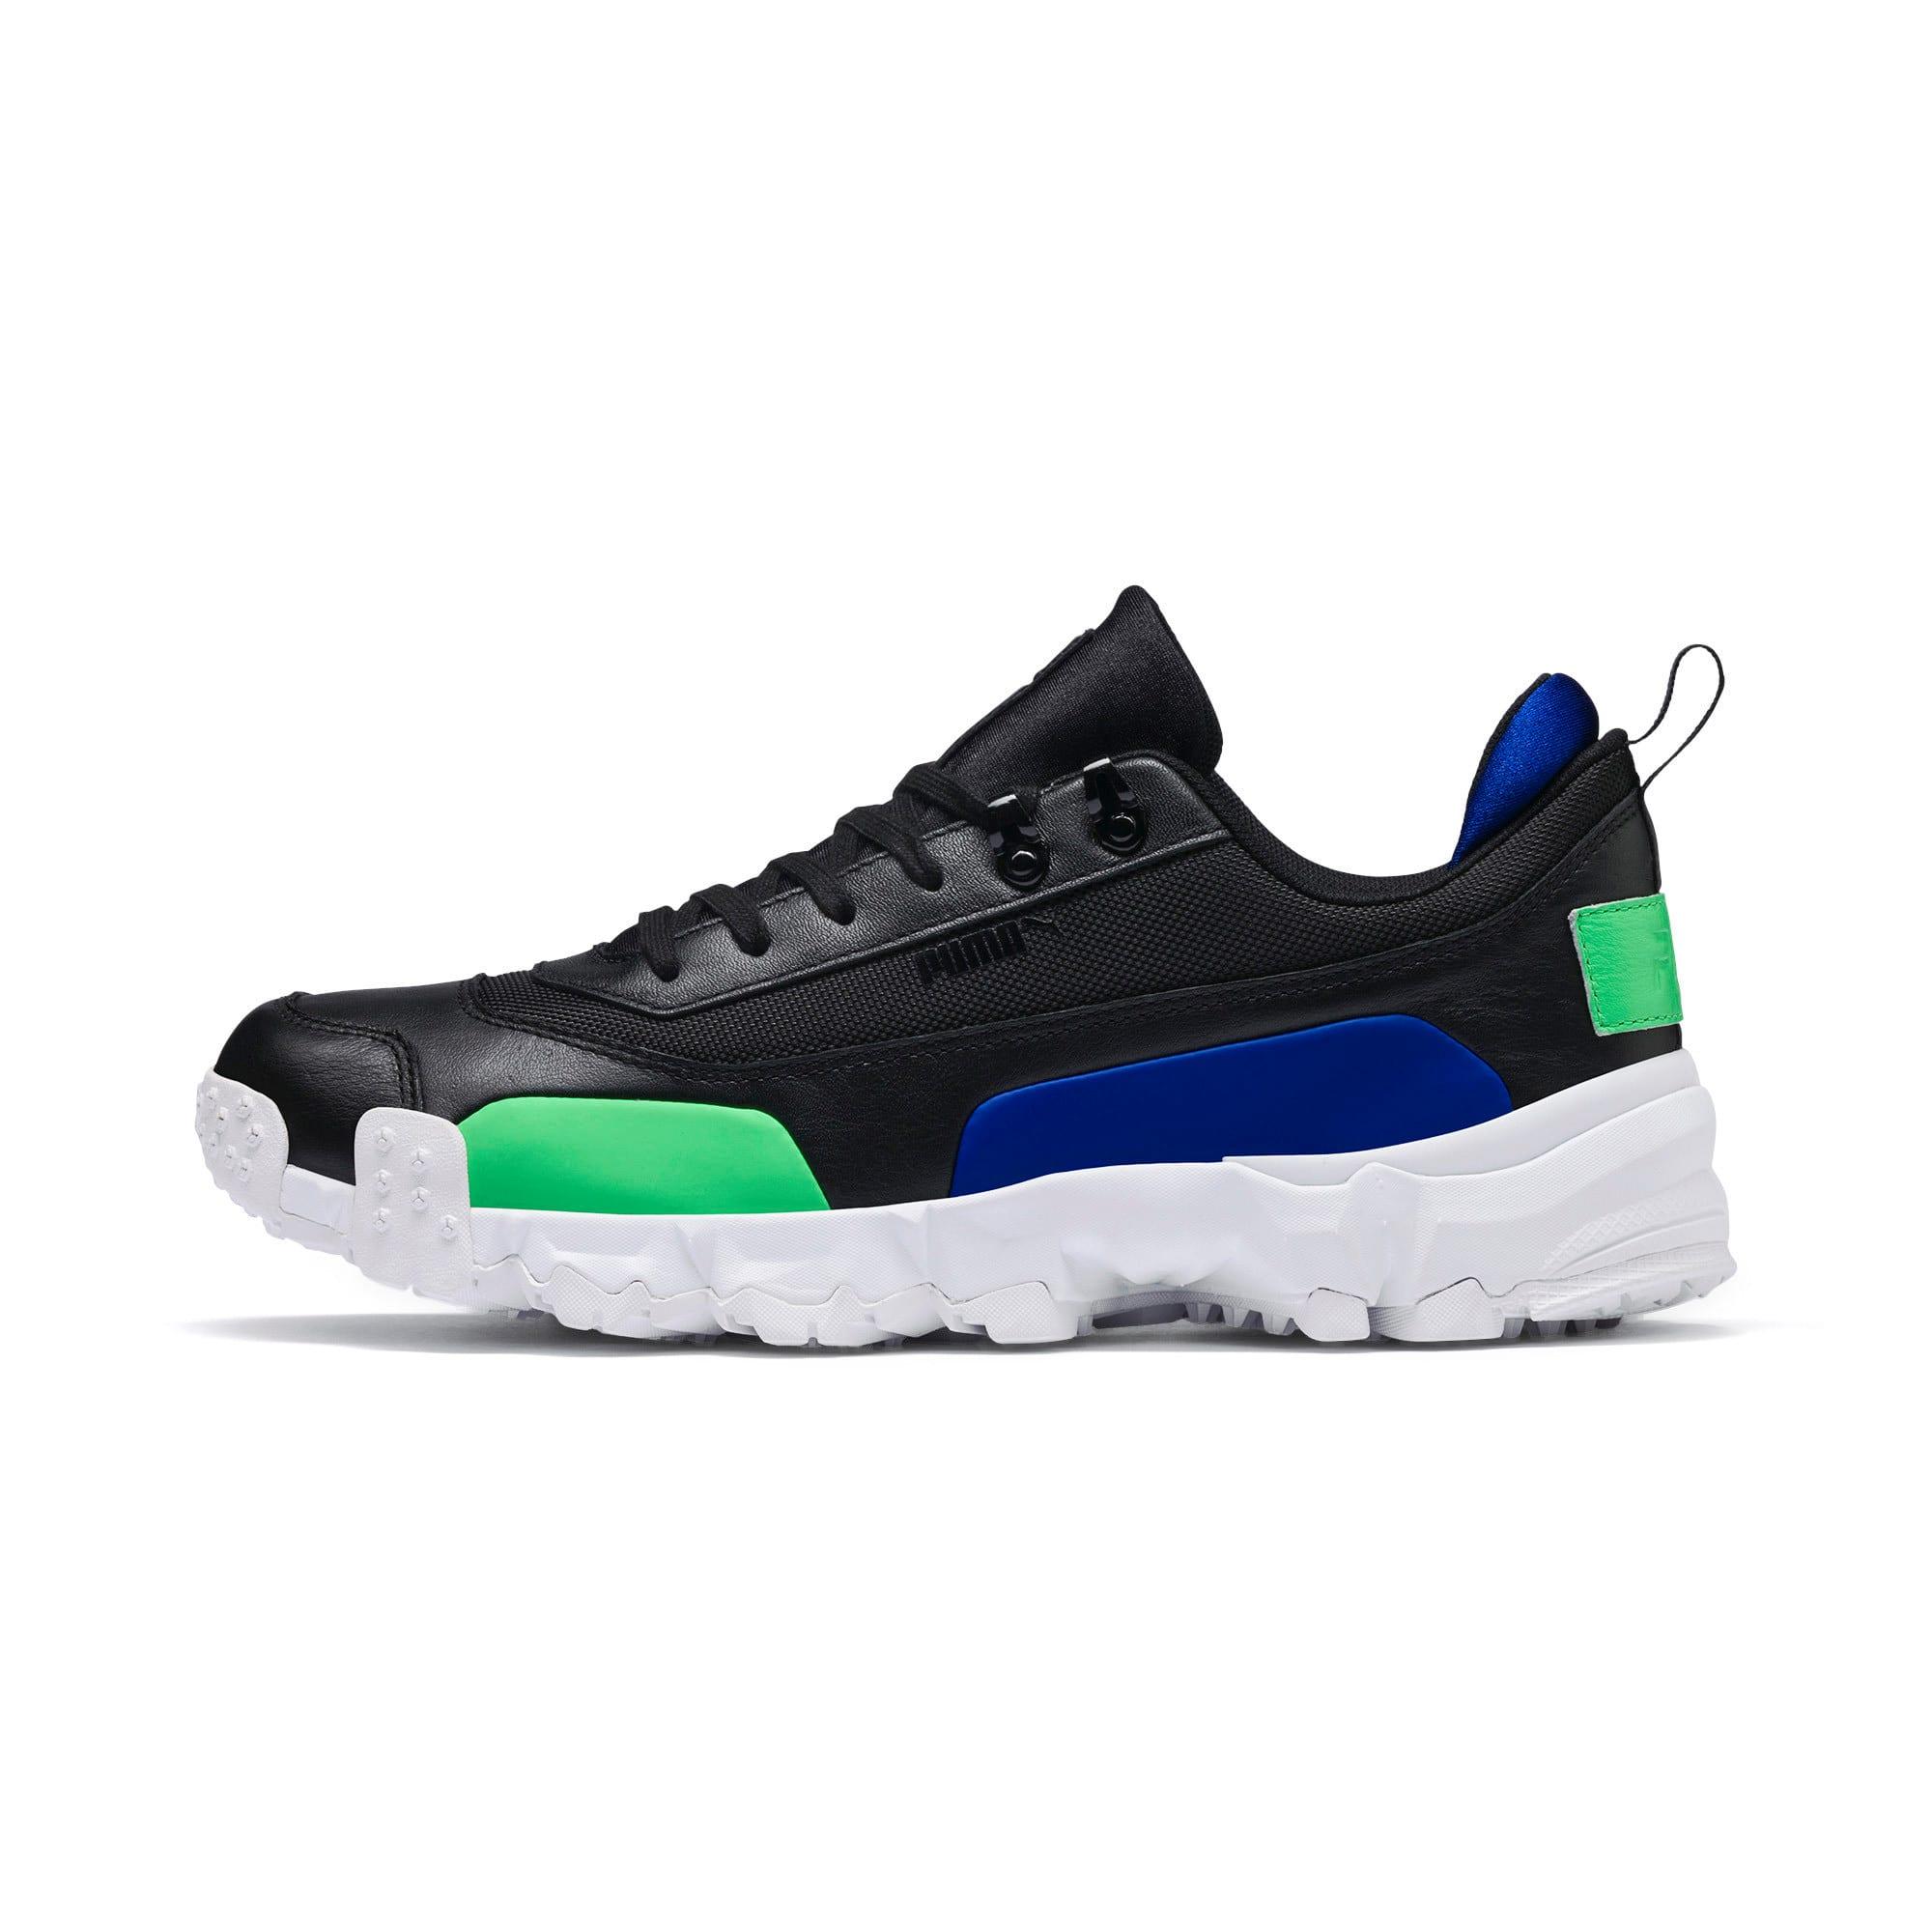 Thumbnail 1 of Trailfox Leather Sneakers, Puma Black-Irish Green, medium